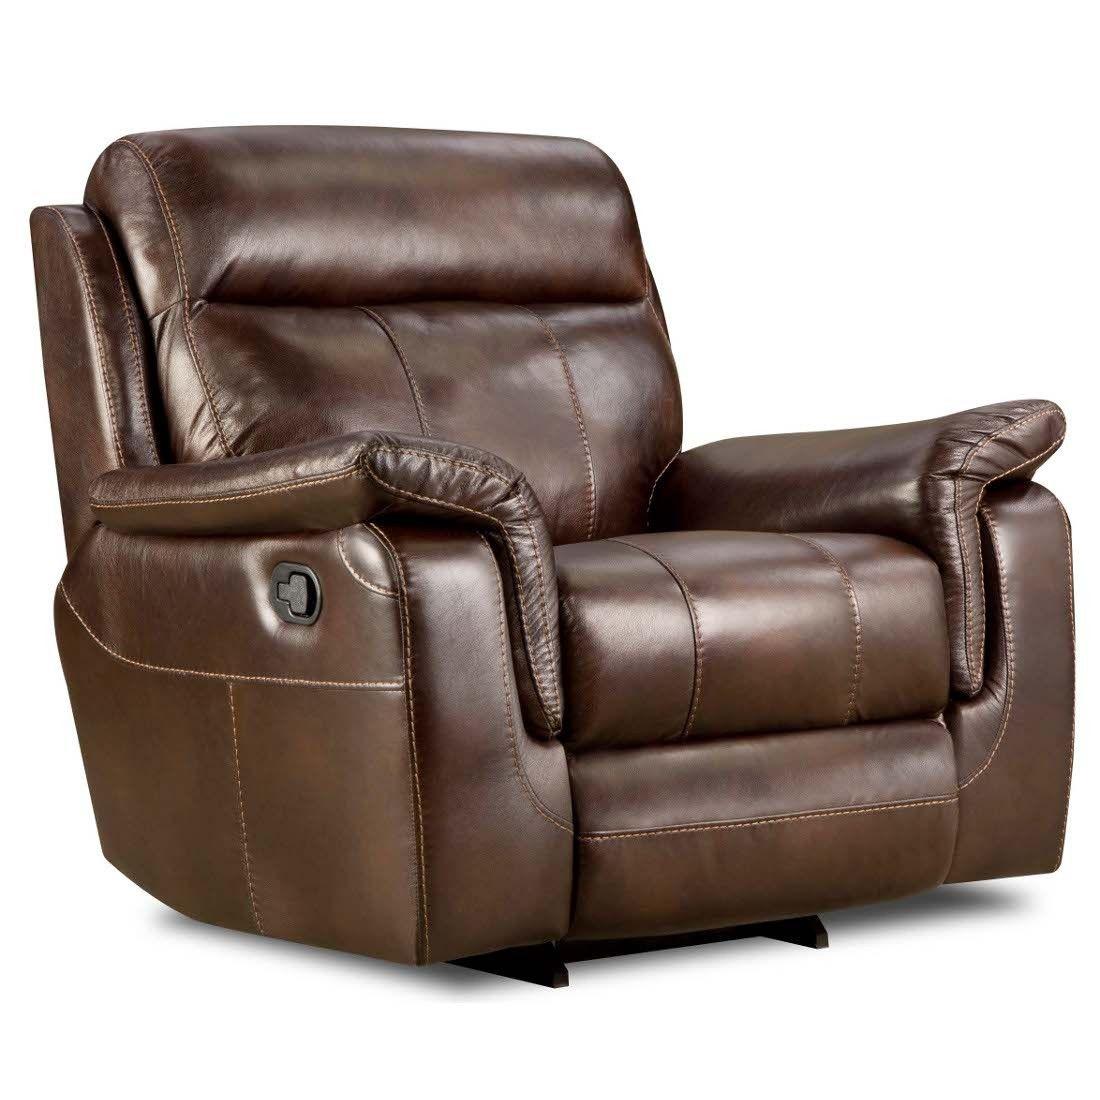 Super Lowery Recliner Ms86210 Recliner Recliner Furniture Short Links Chair Design For Home Short Linksinfo